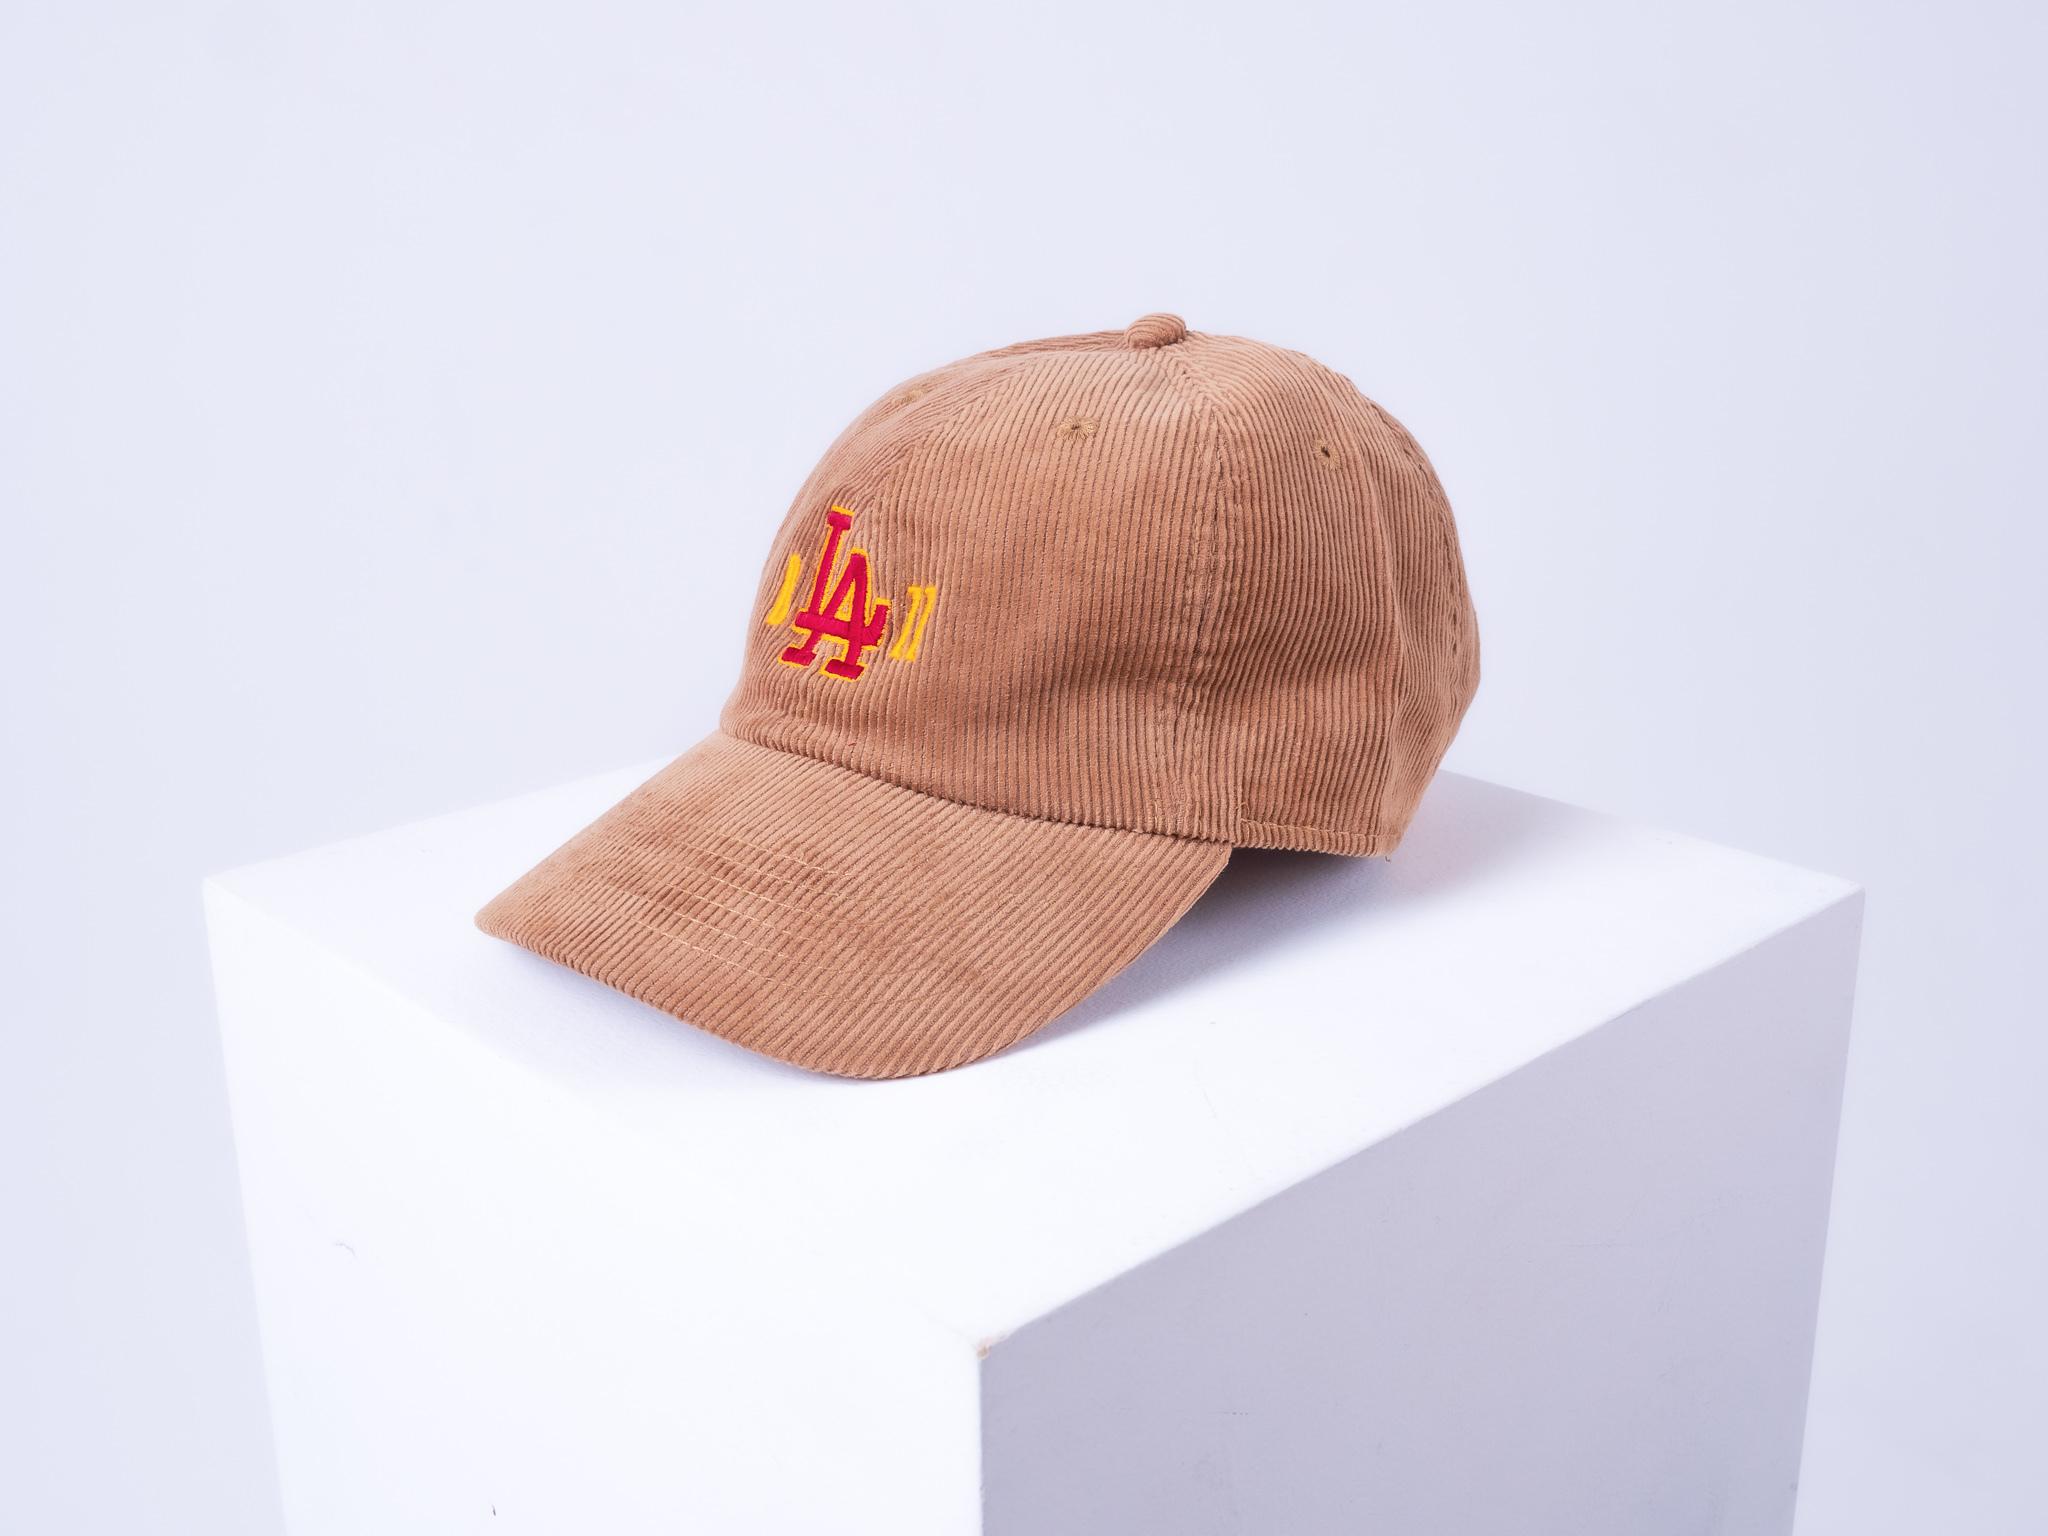 b'LA'zz Corduroy Cap [KHAKI]